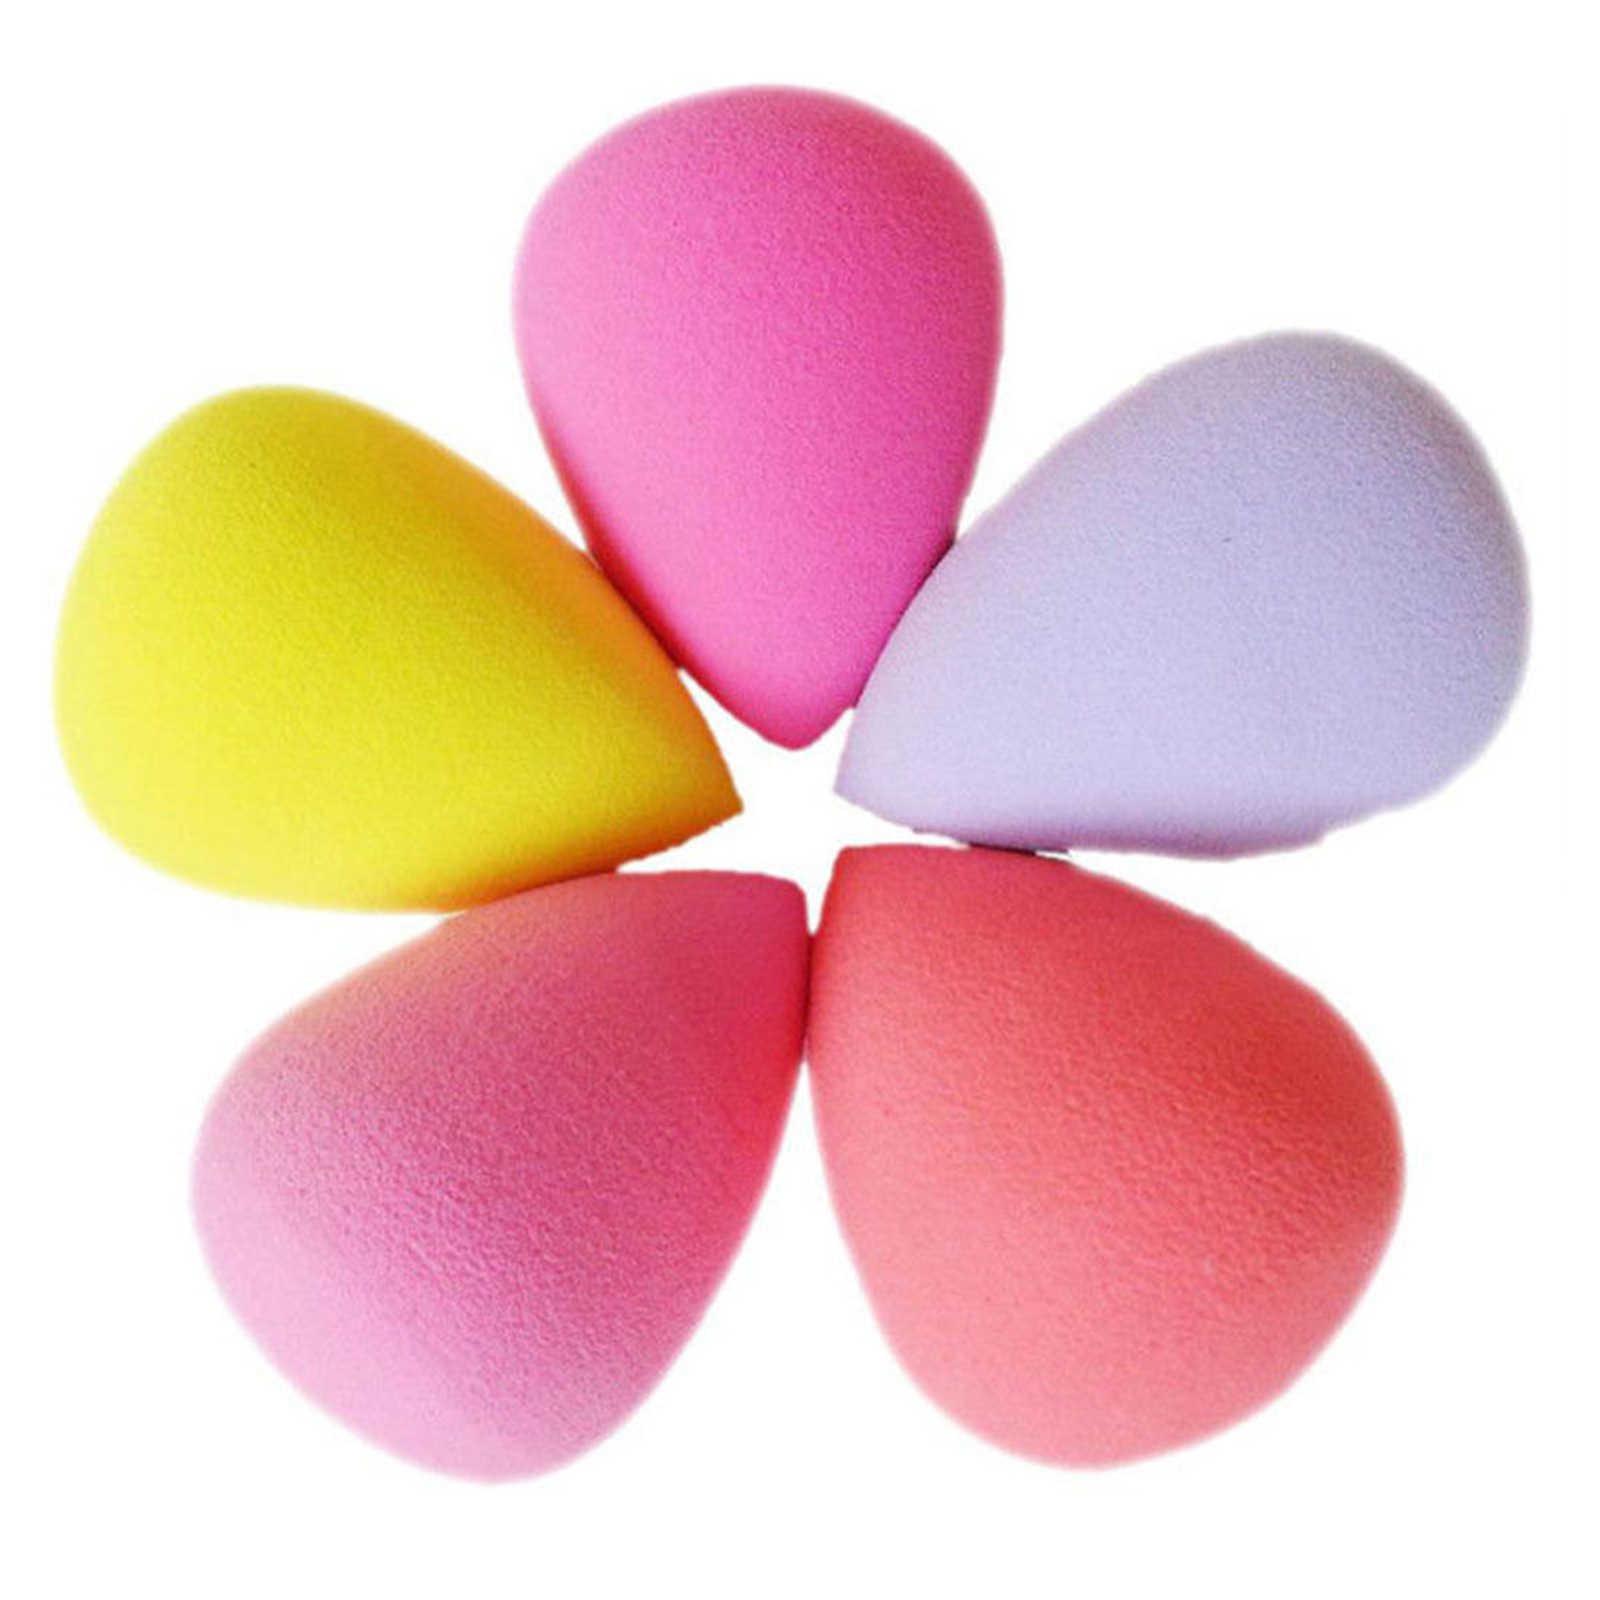 1 Pcs Professionele Soft Make Foundation Cosmetische Puff Water Drop Kalebas Vorm Make-Up Sponzen Glad Gezicht Makeup Beauty Tools